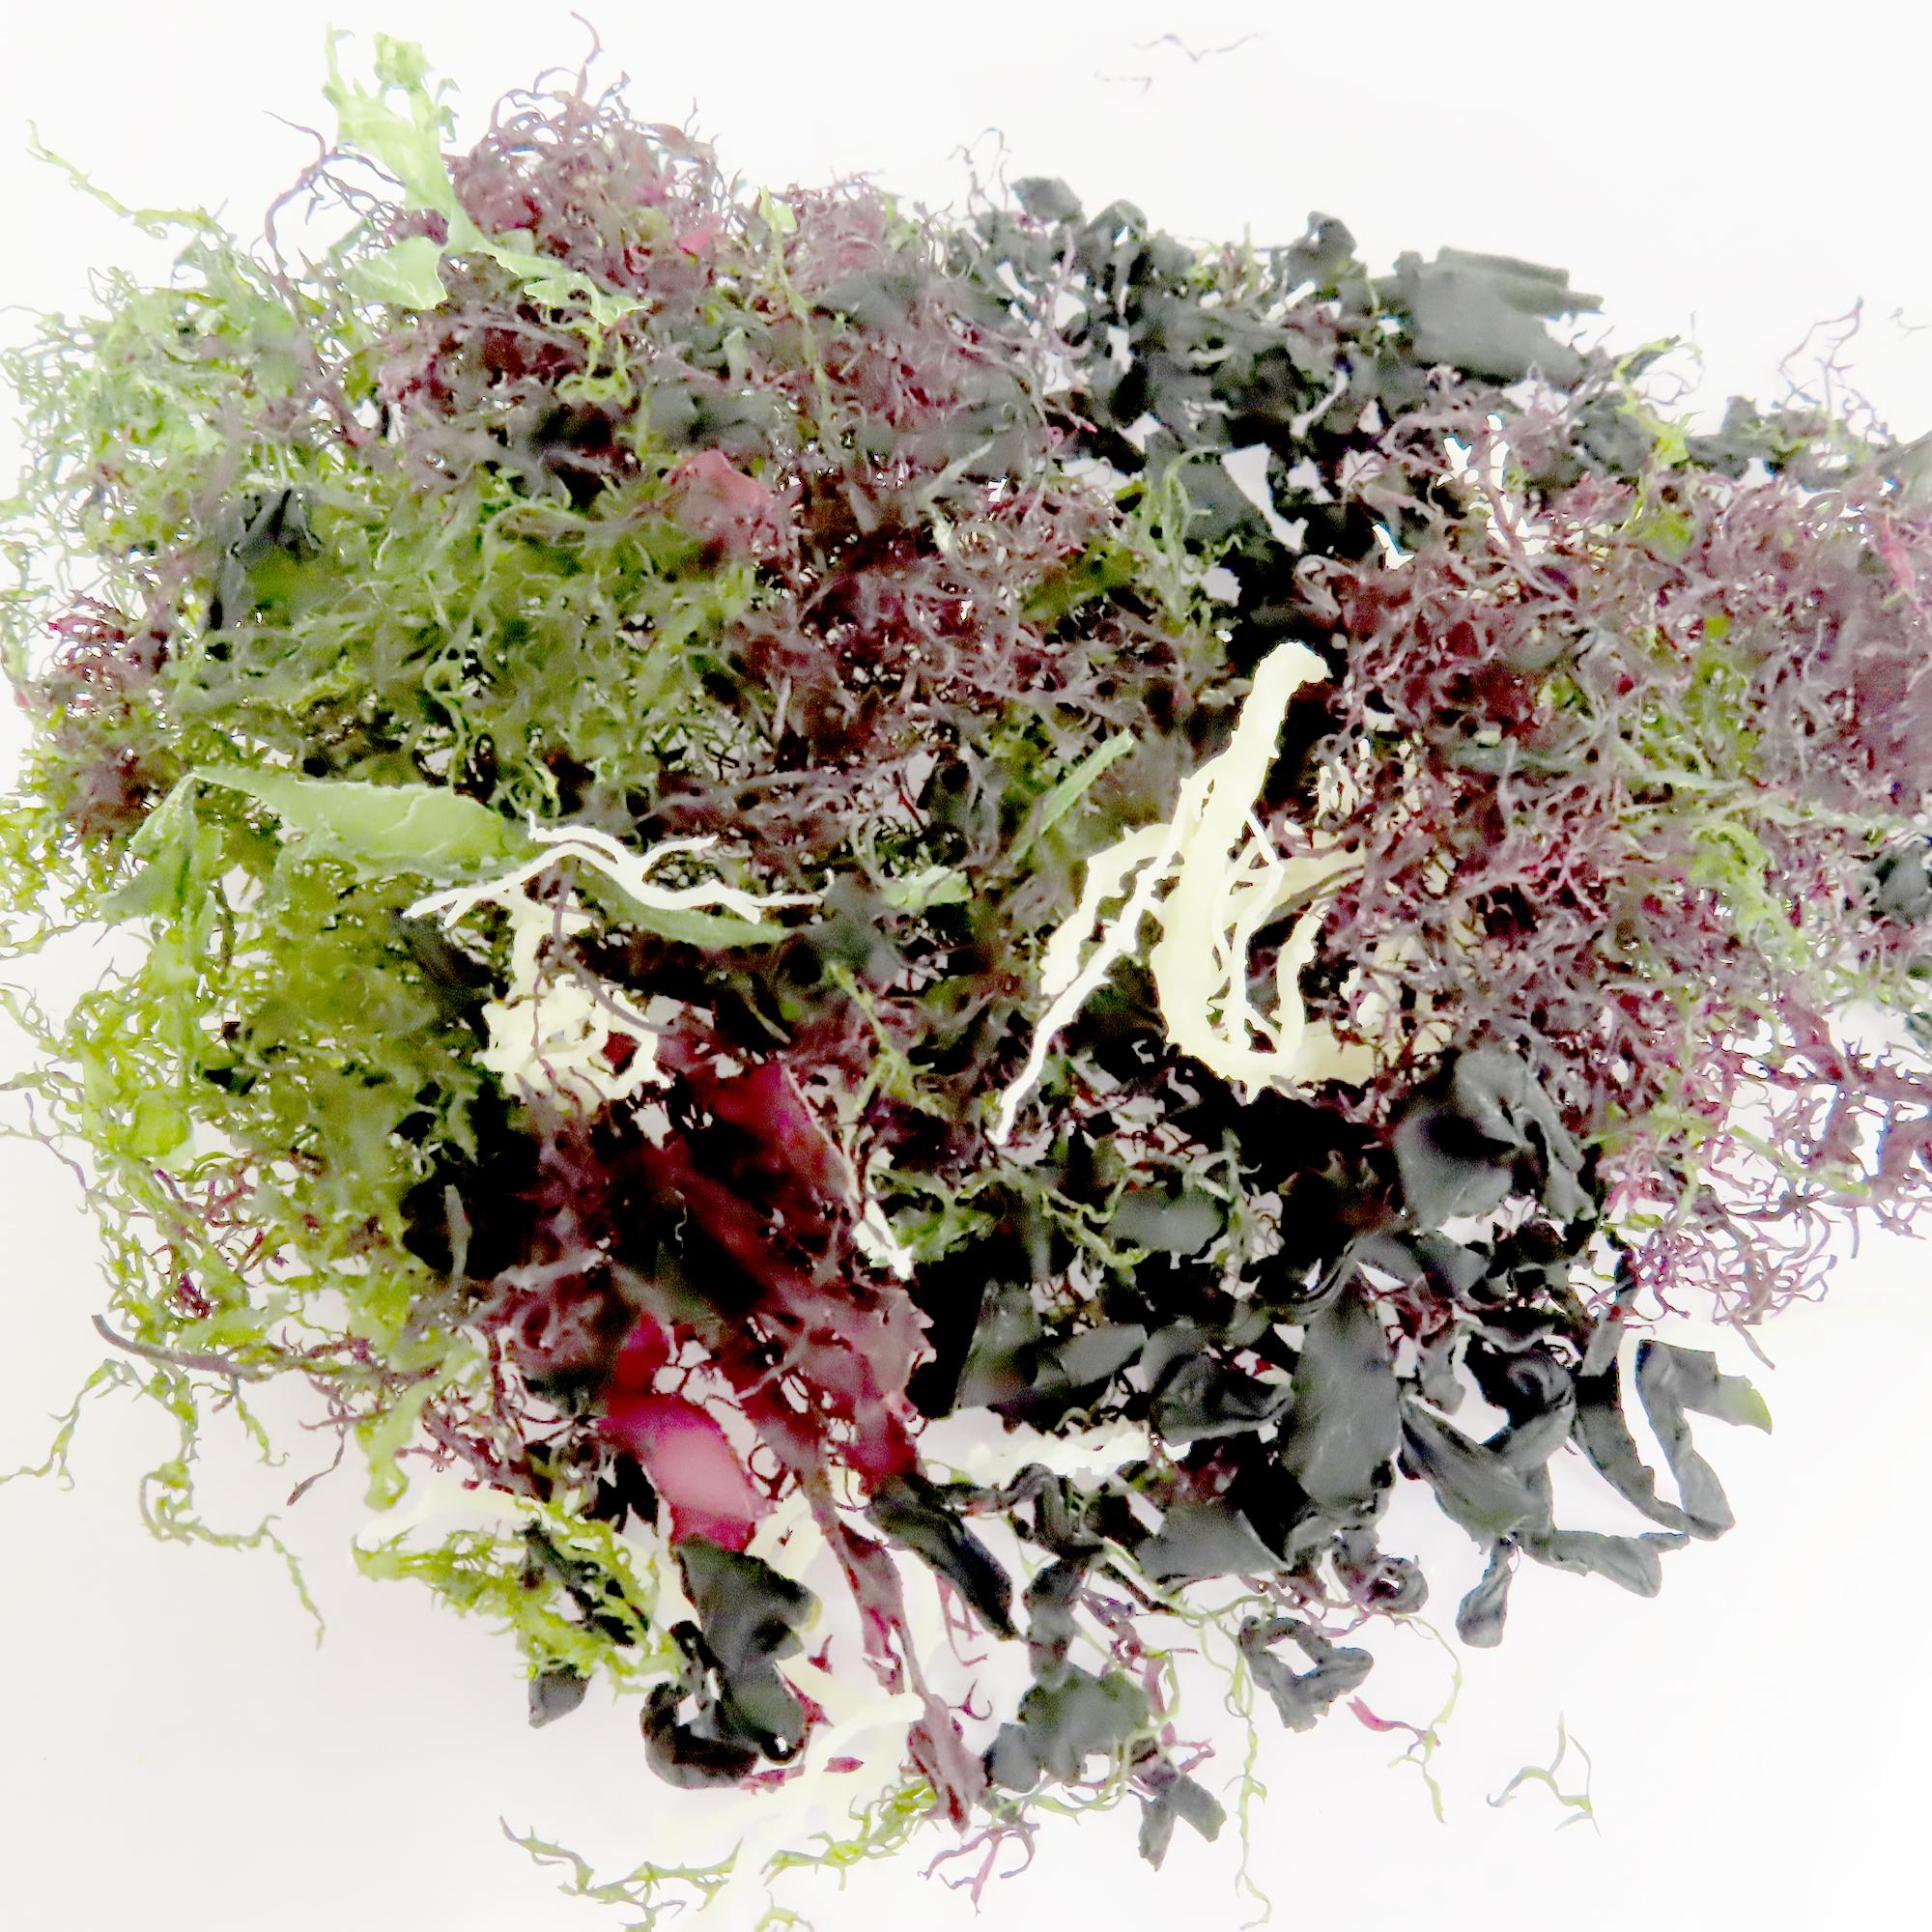 Image Nihon Shokken Mix Seaweed 日本食研海澡 25grams